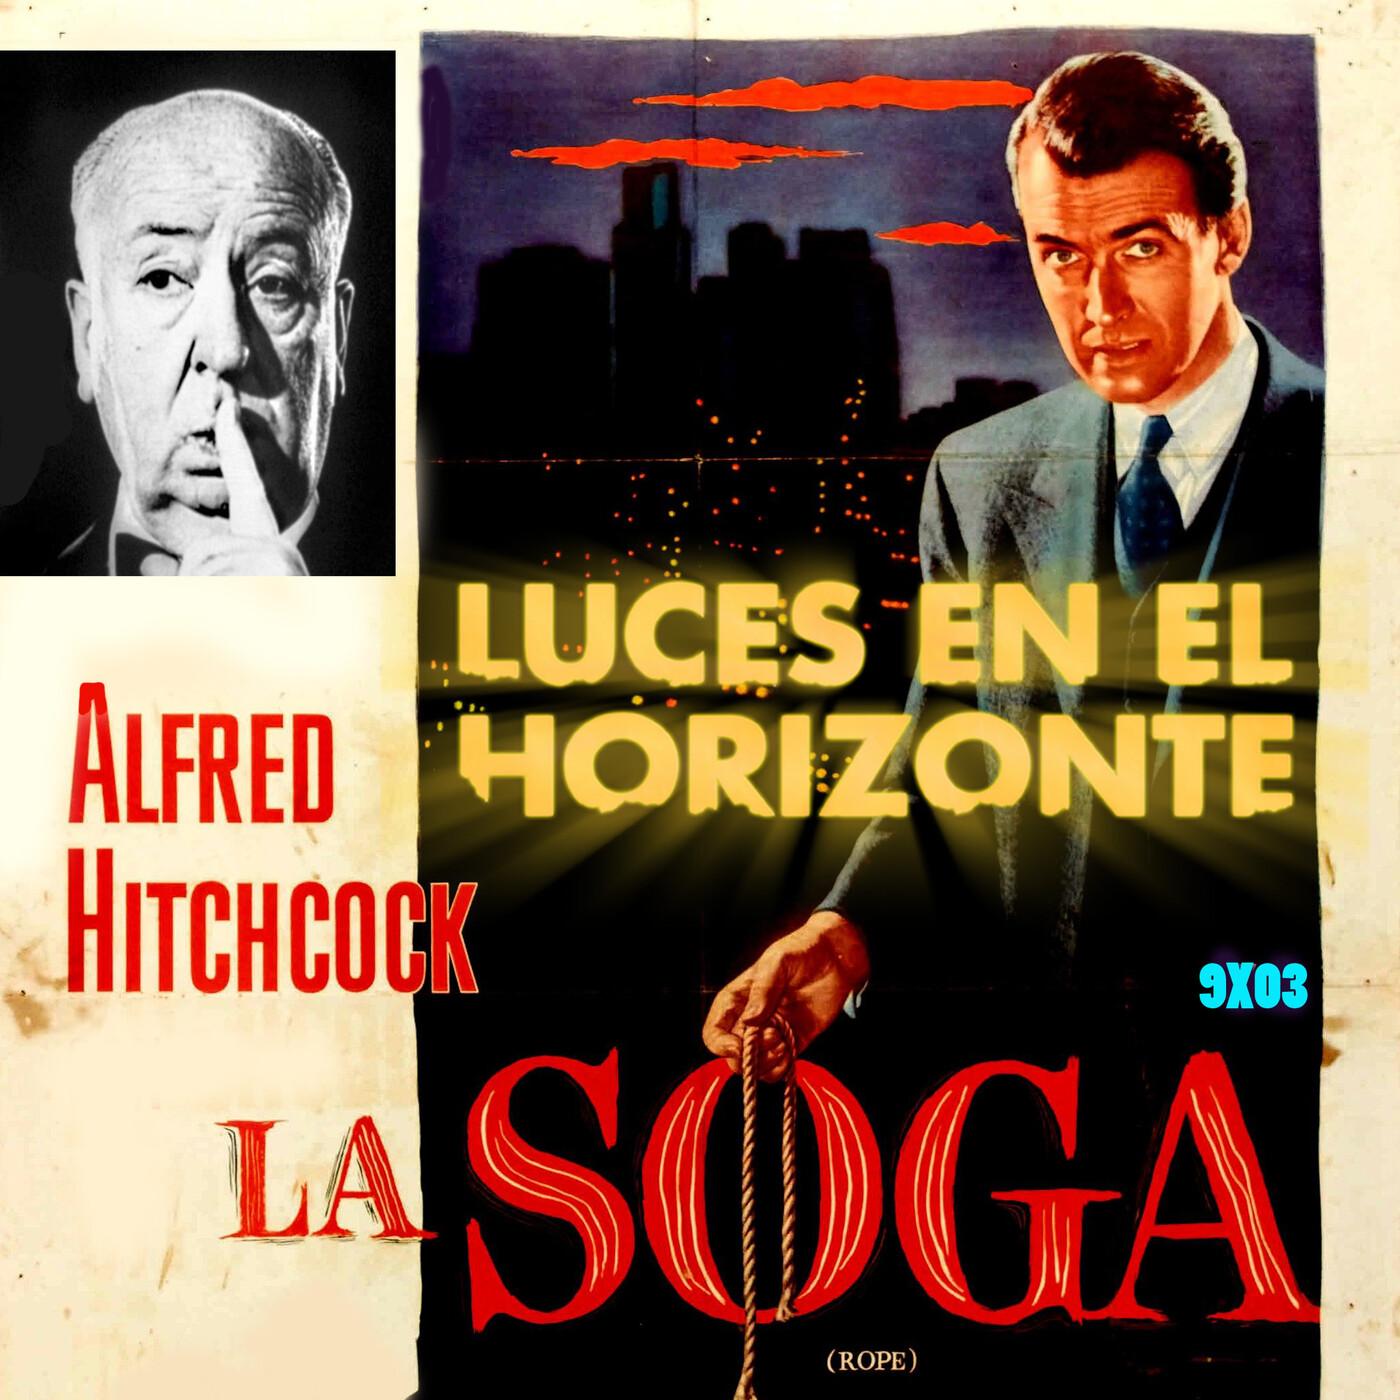 LA SOGA De Alfred Hitchcock - Luces en el Horizonte 9X03